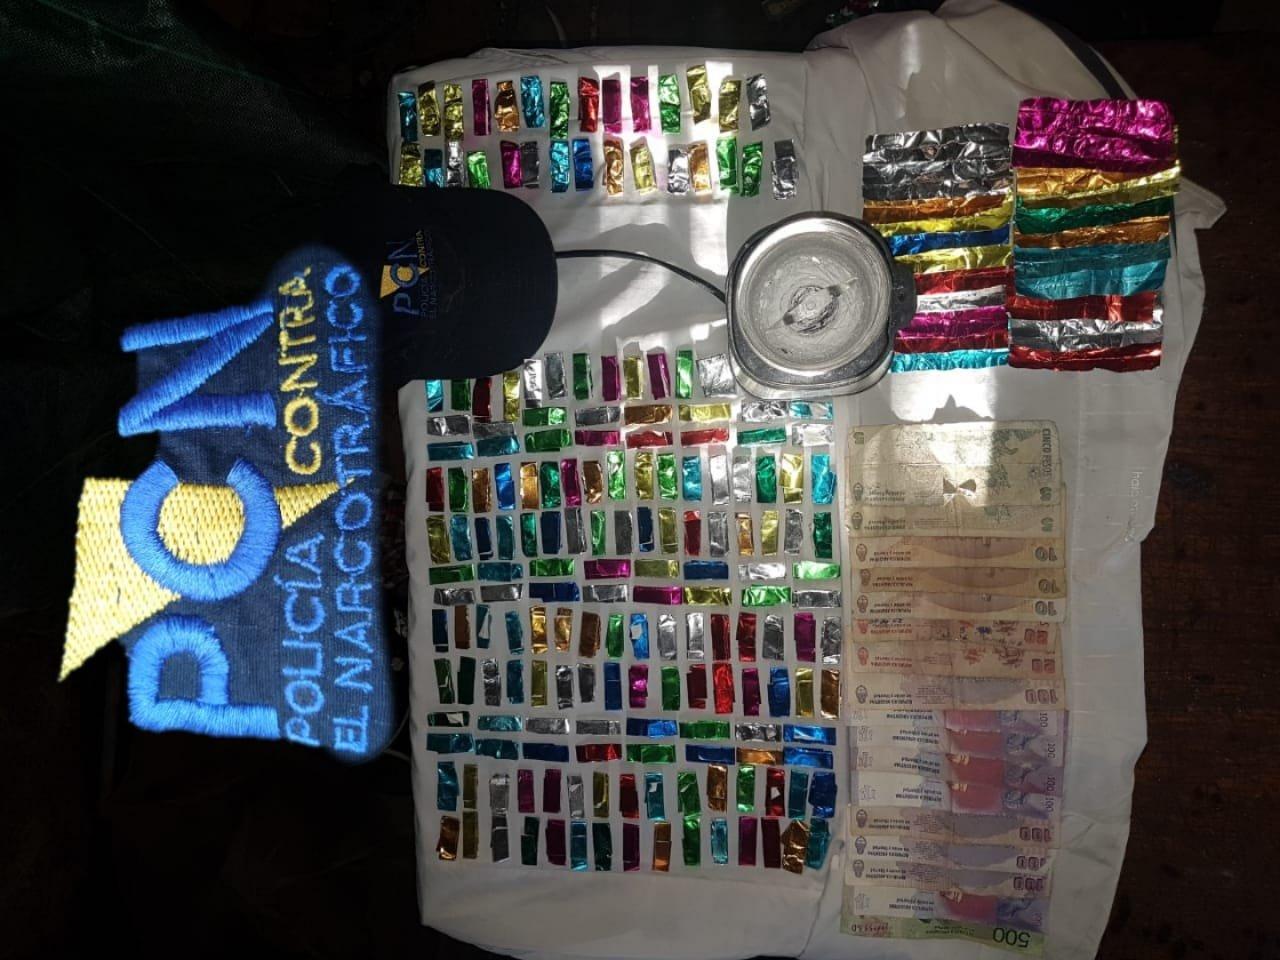 droga-operativo-mendoza-guaymallén-las-heras-kiosco-policiales-hoy